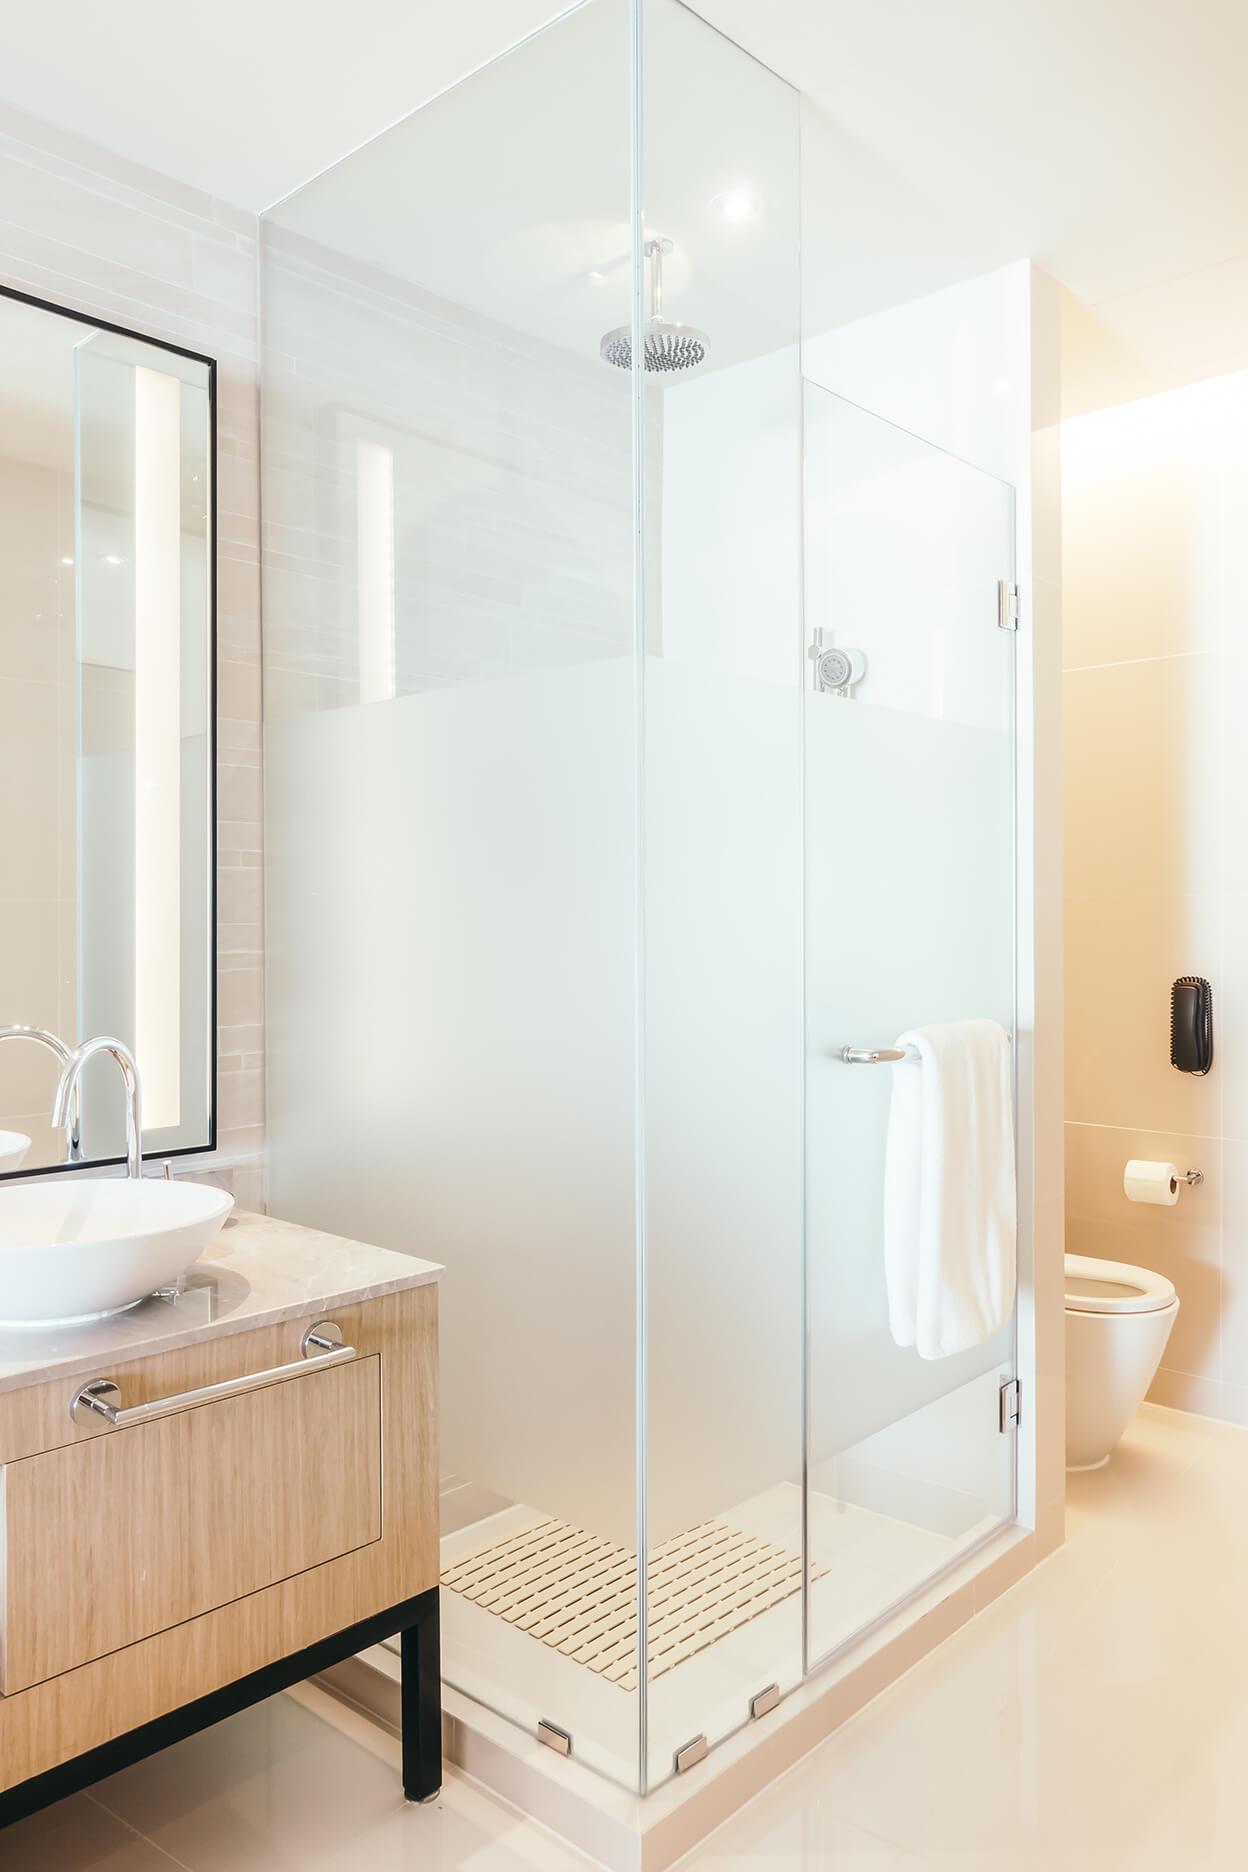 Unique Shower Door Ideas For Small Bathrooms